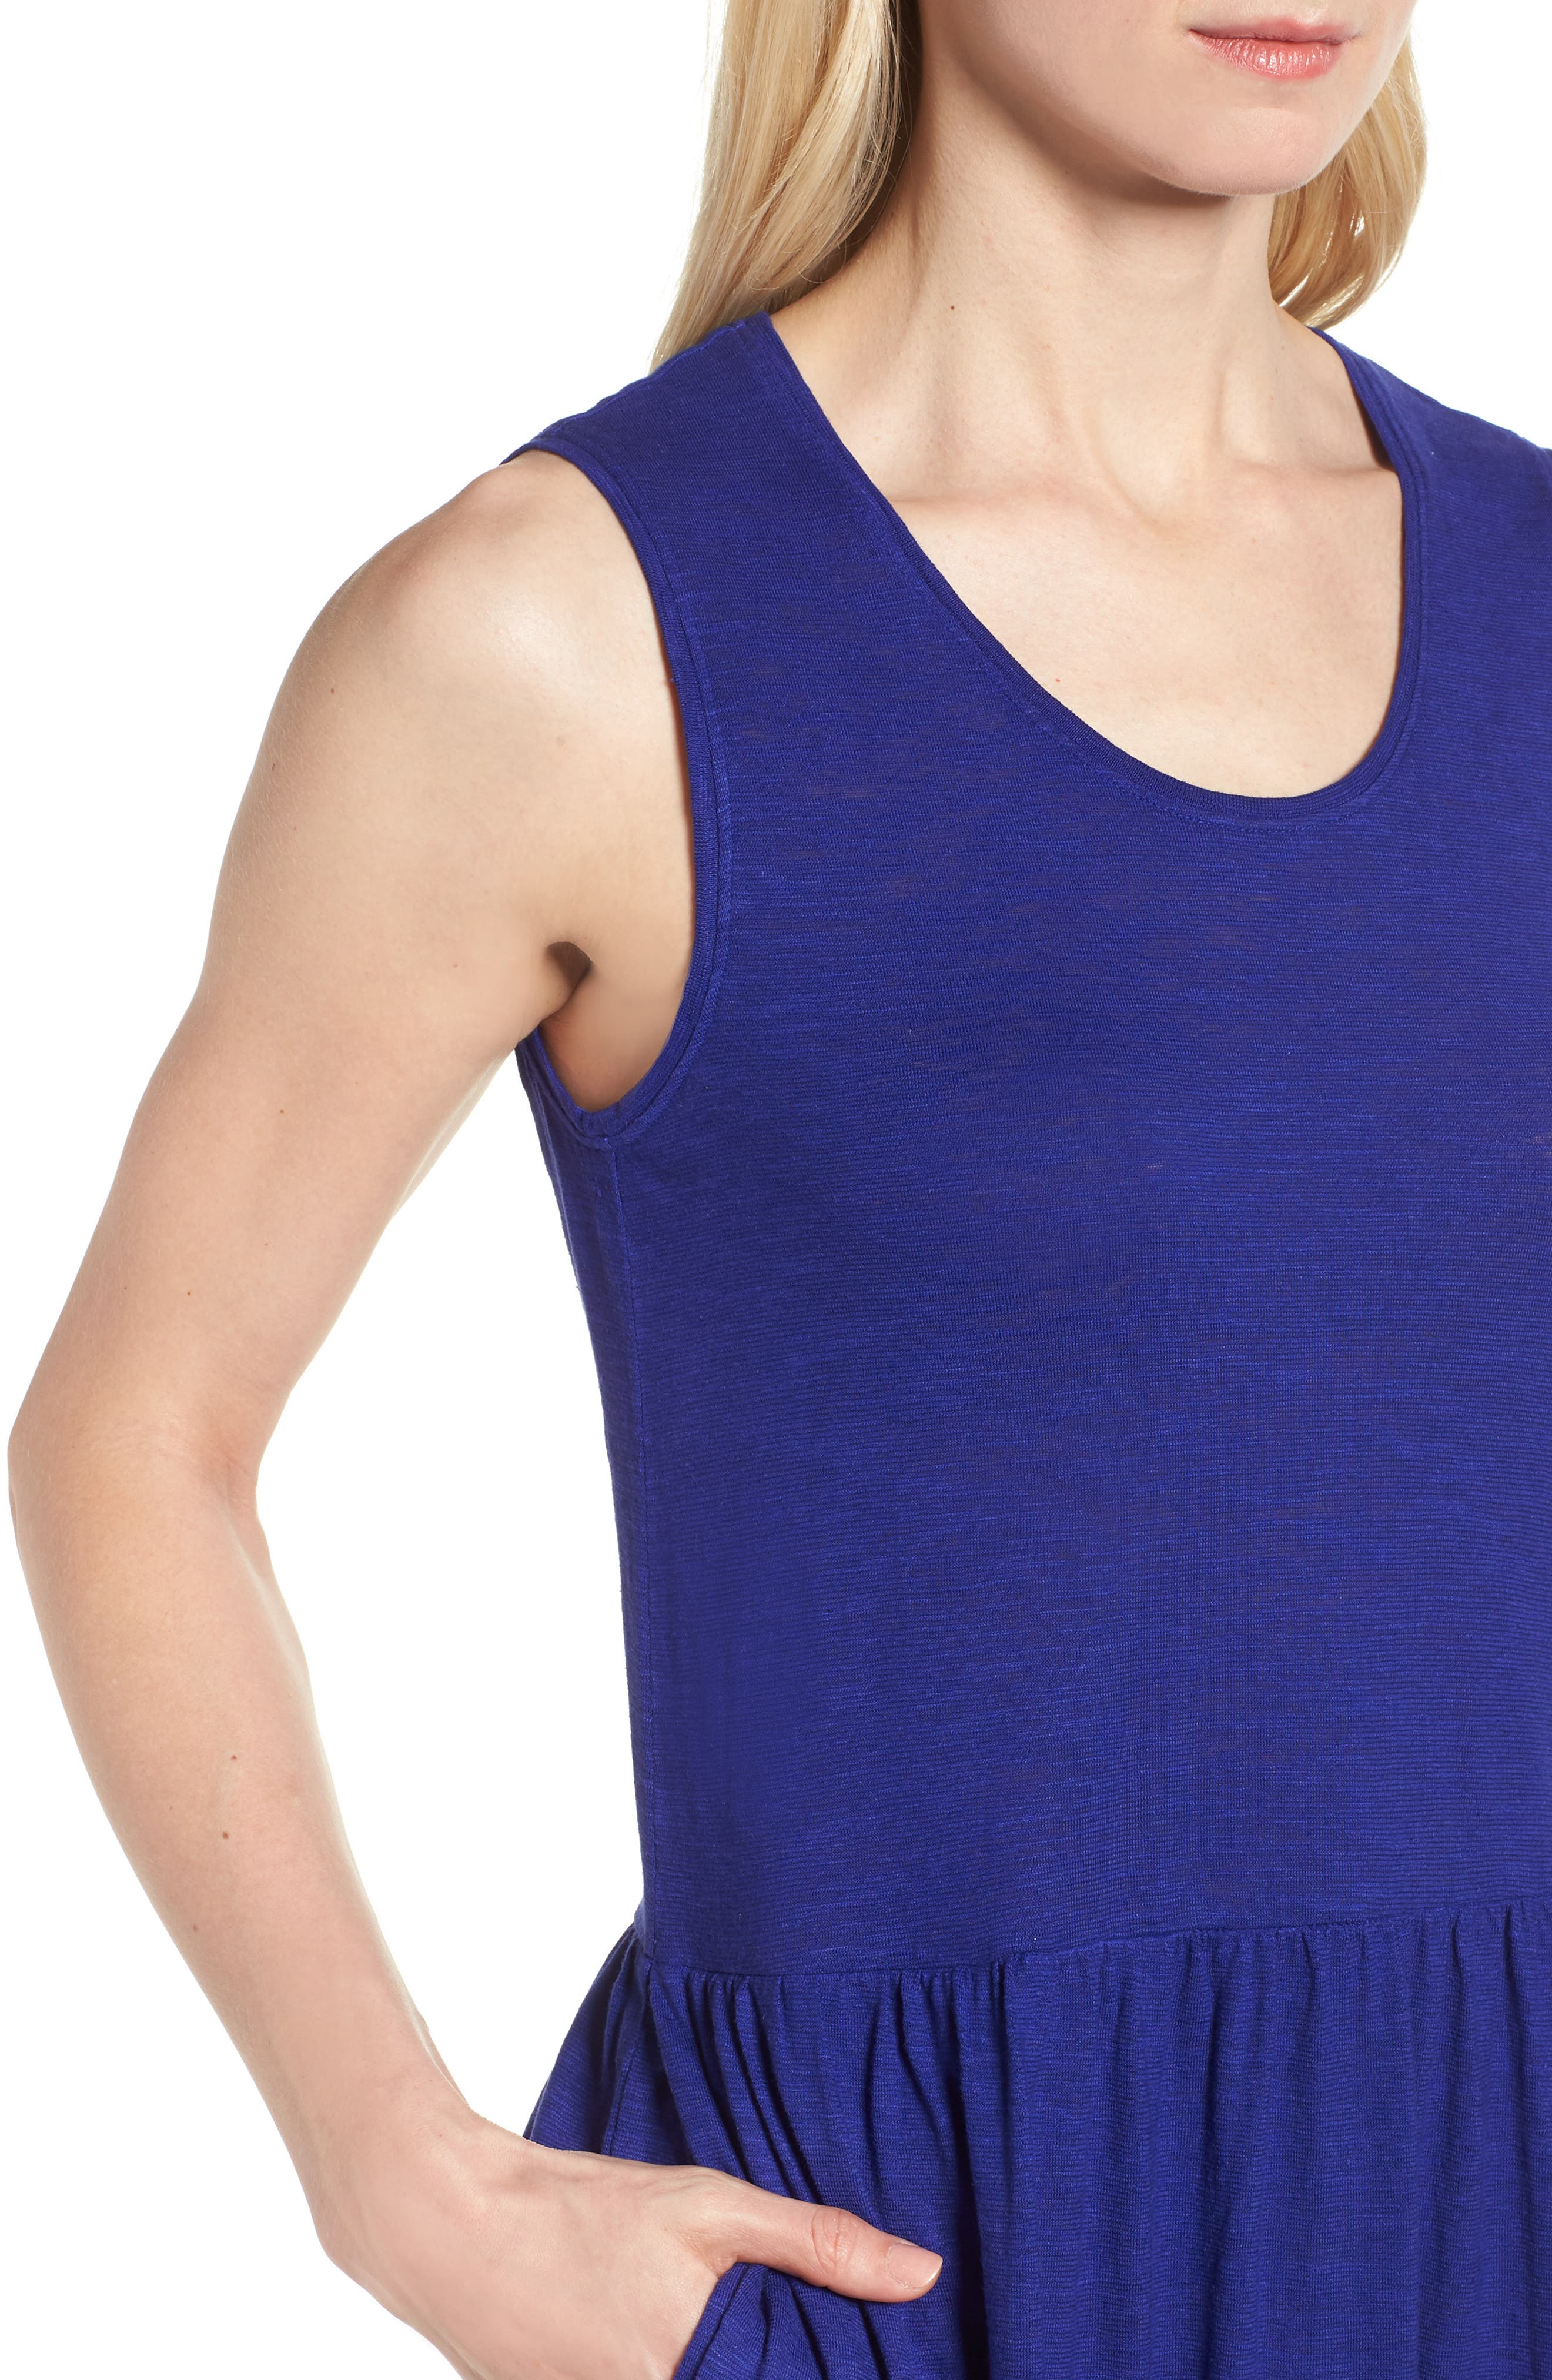 Scooped Neck Hemp & Cotton Midi Dress,                             Alternate thumbnail 4, color,                             Blue Violet